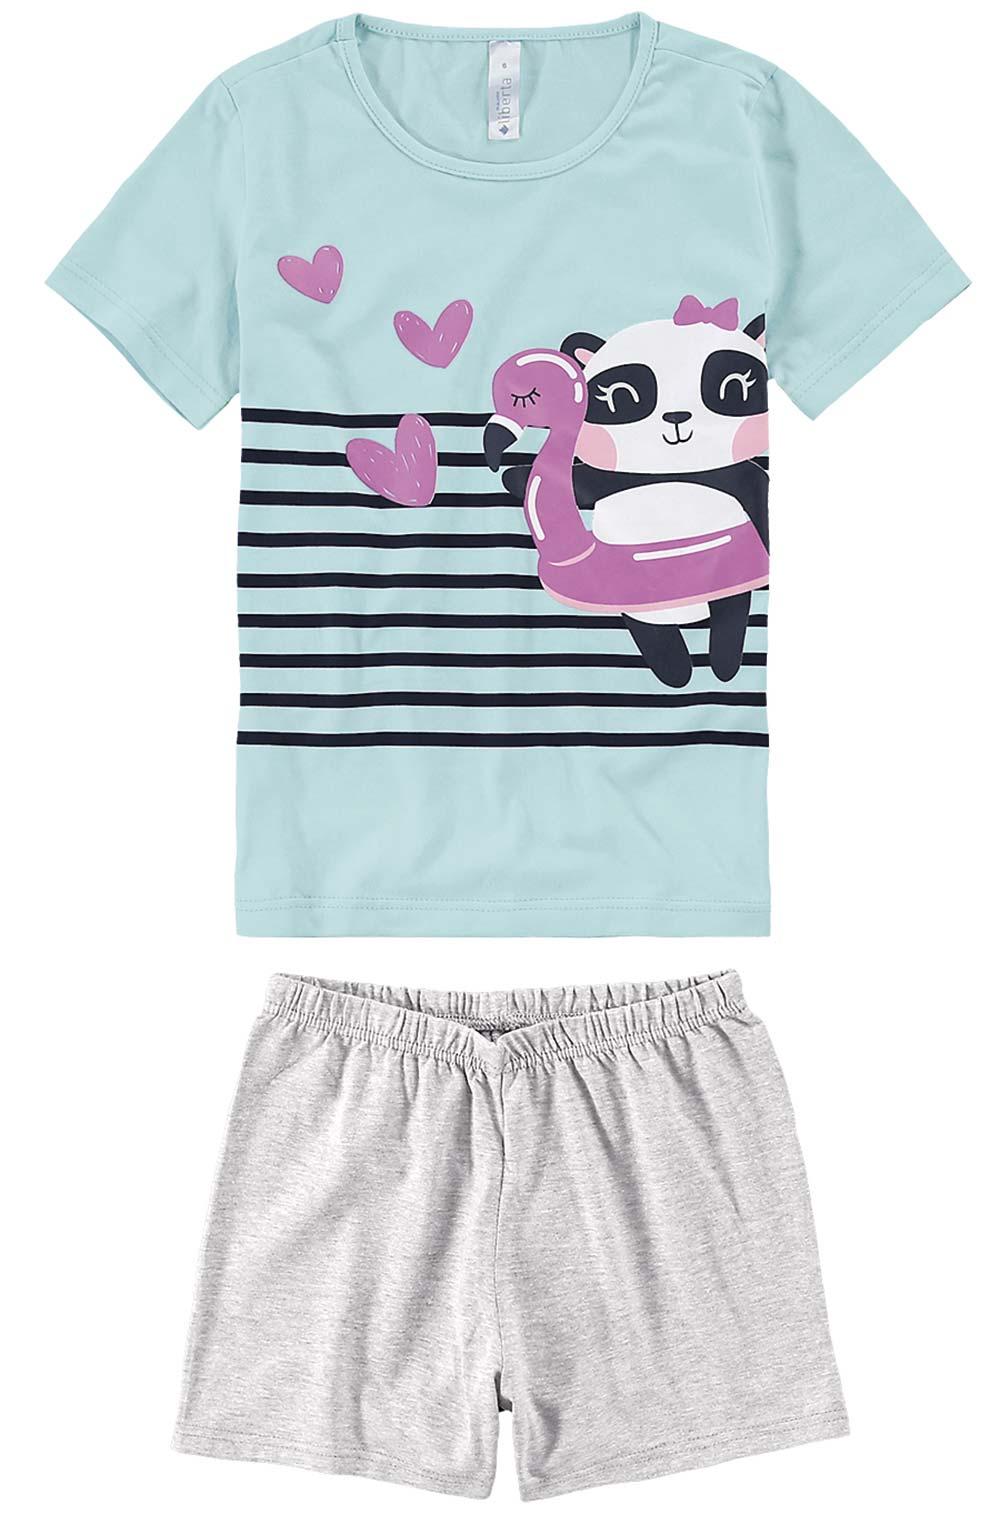 Pijama Infantil Feminino Verão Azul Panda Love Malwee